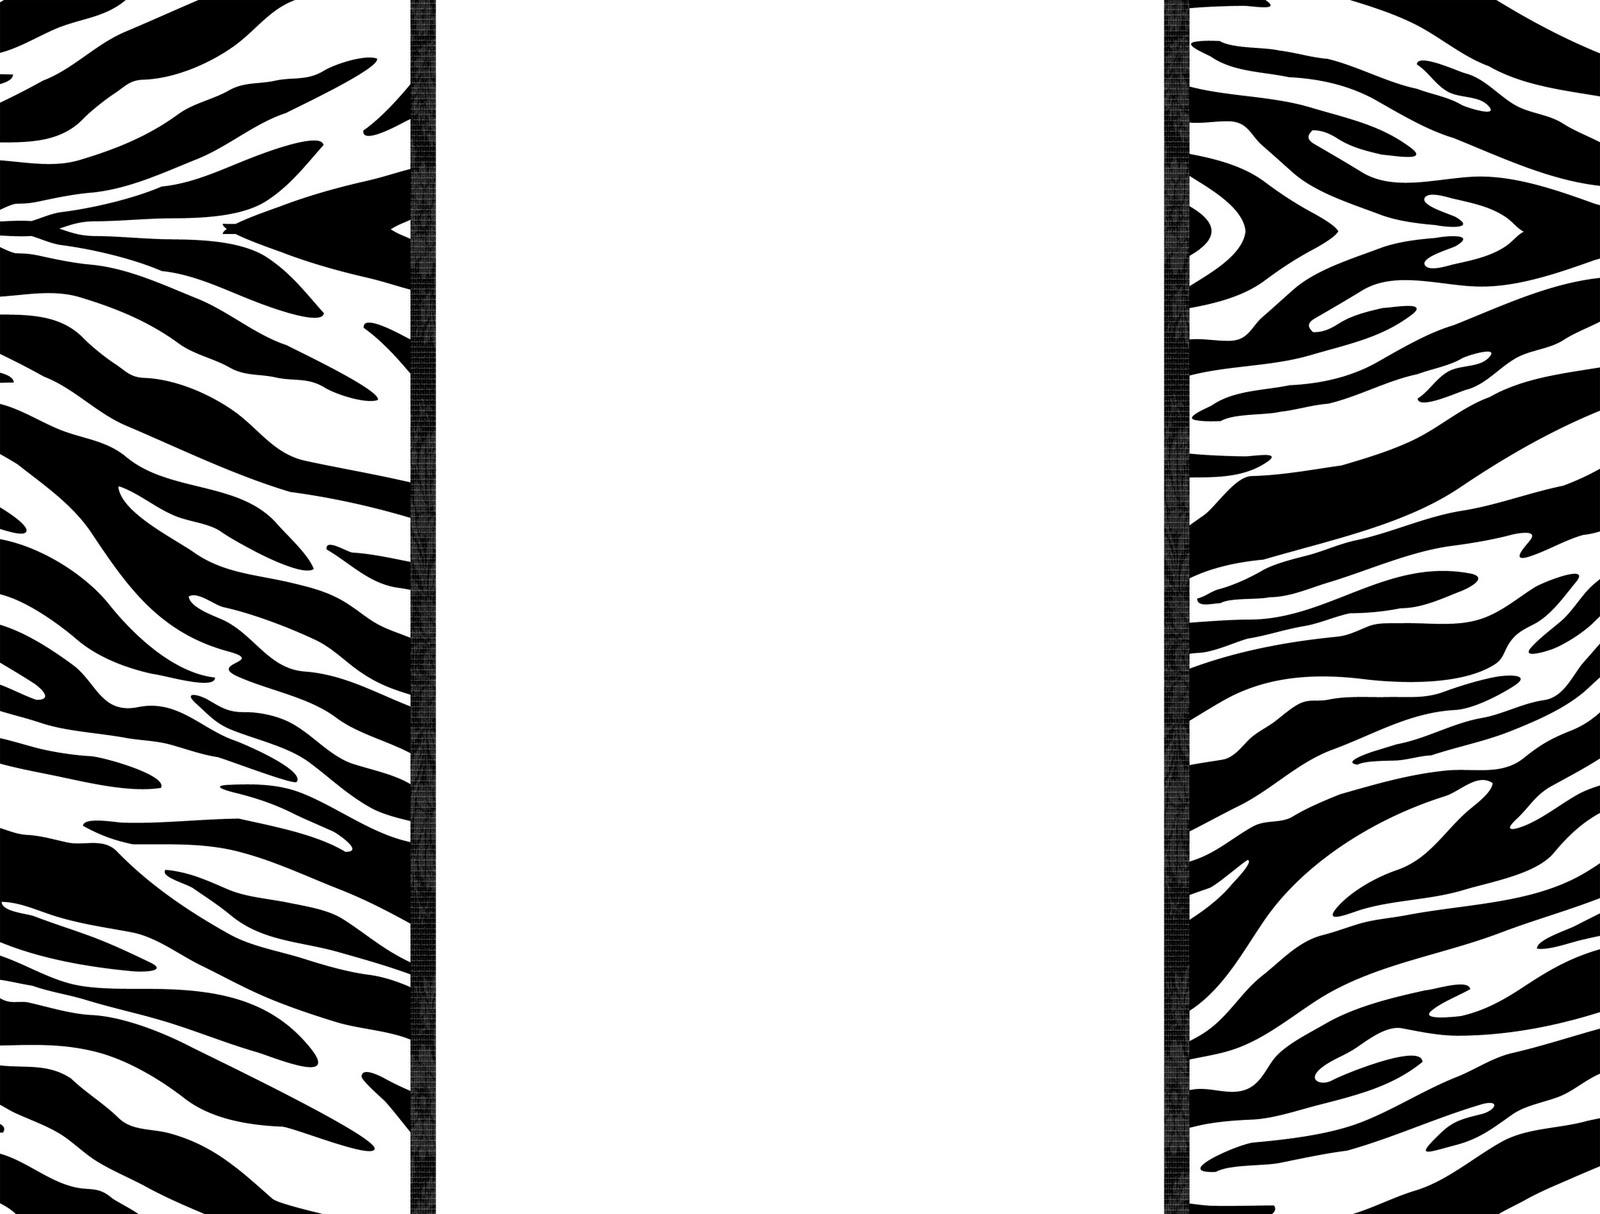 Zebra border template royalty free zebra border template clip art cristi s creations zebra by request maxwellsz